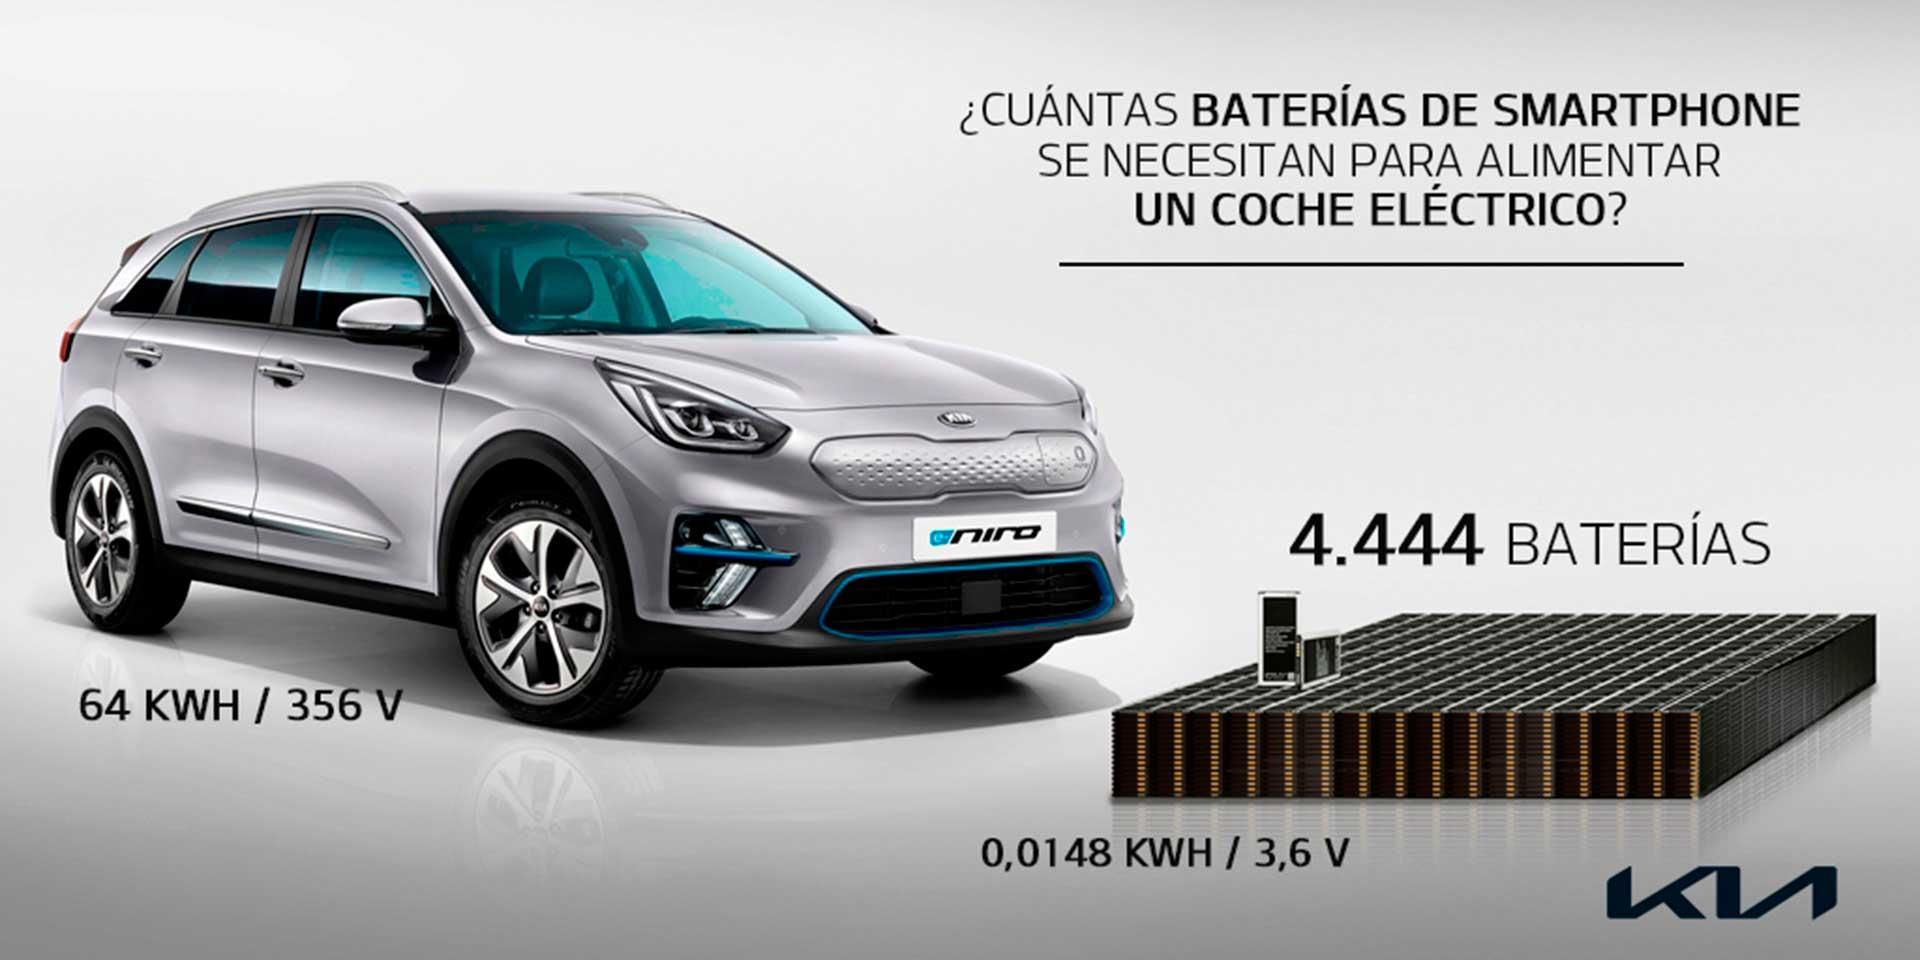 ¿Cuántas baterías de teléfono móvil se necesita para alimentar un coche eléctrico?